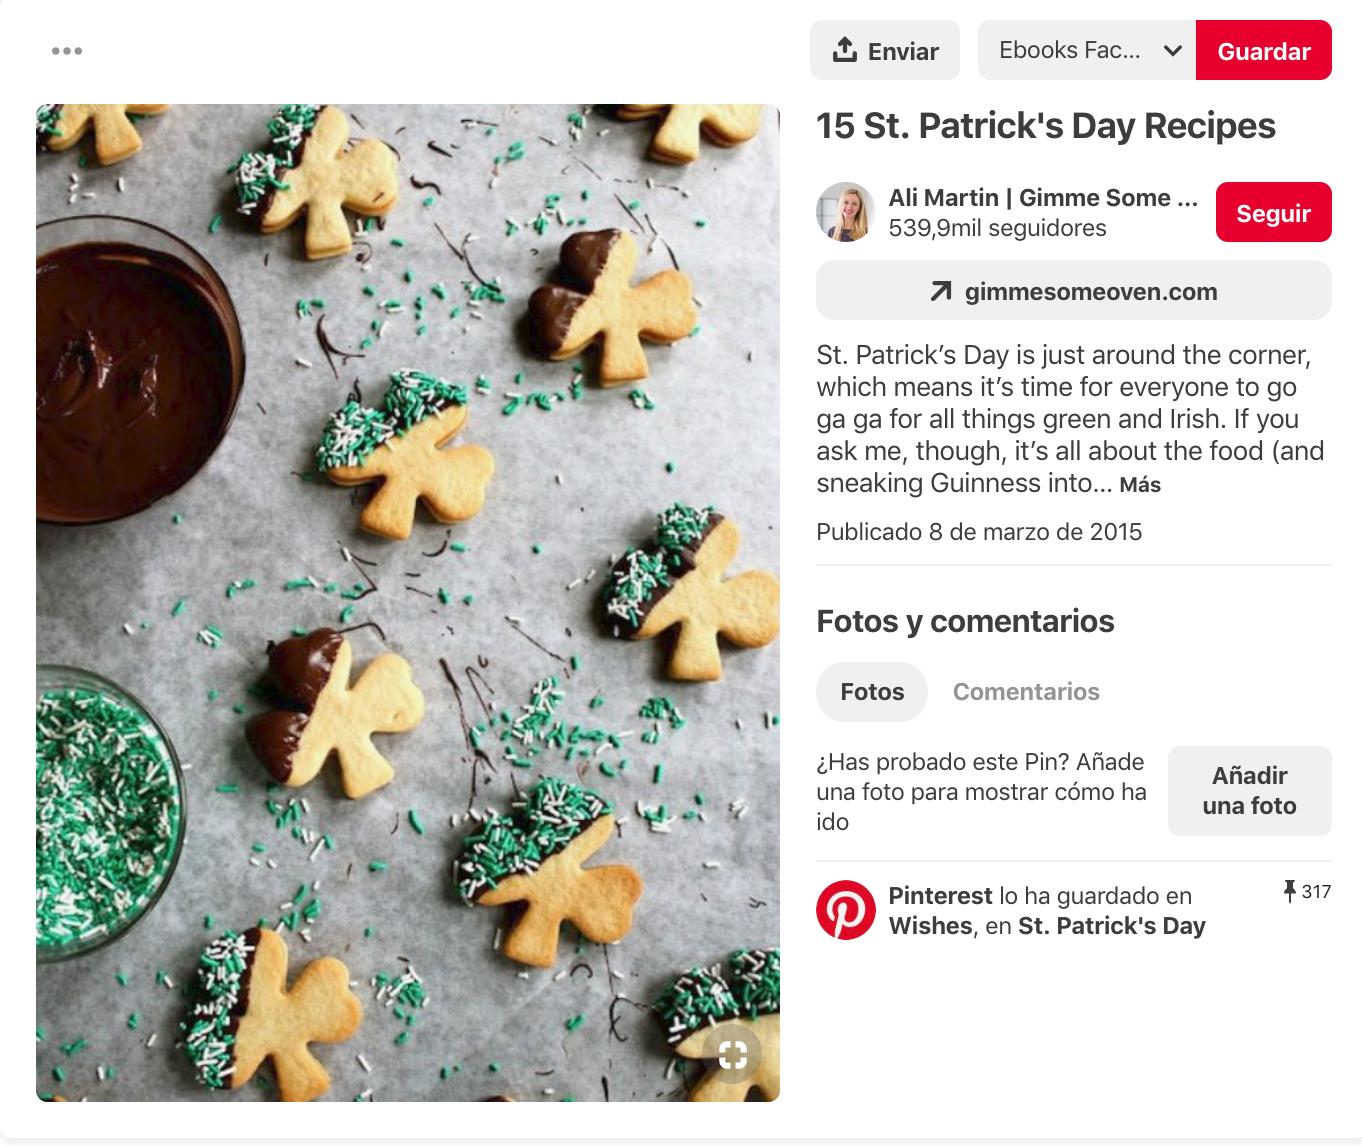 Qué es Pinterest - Análisis de un pin